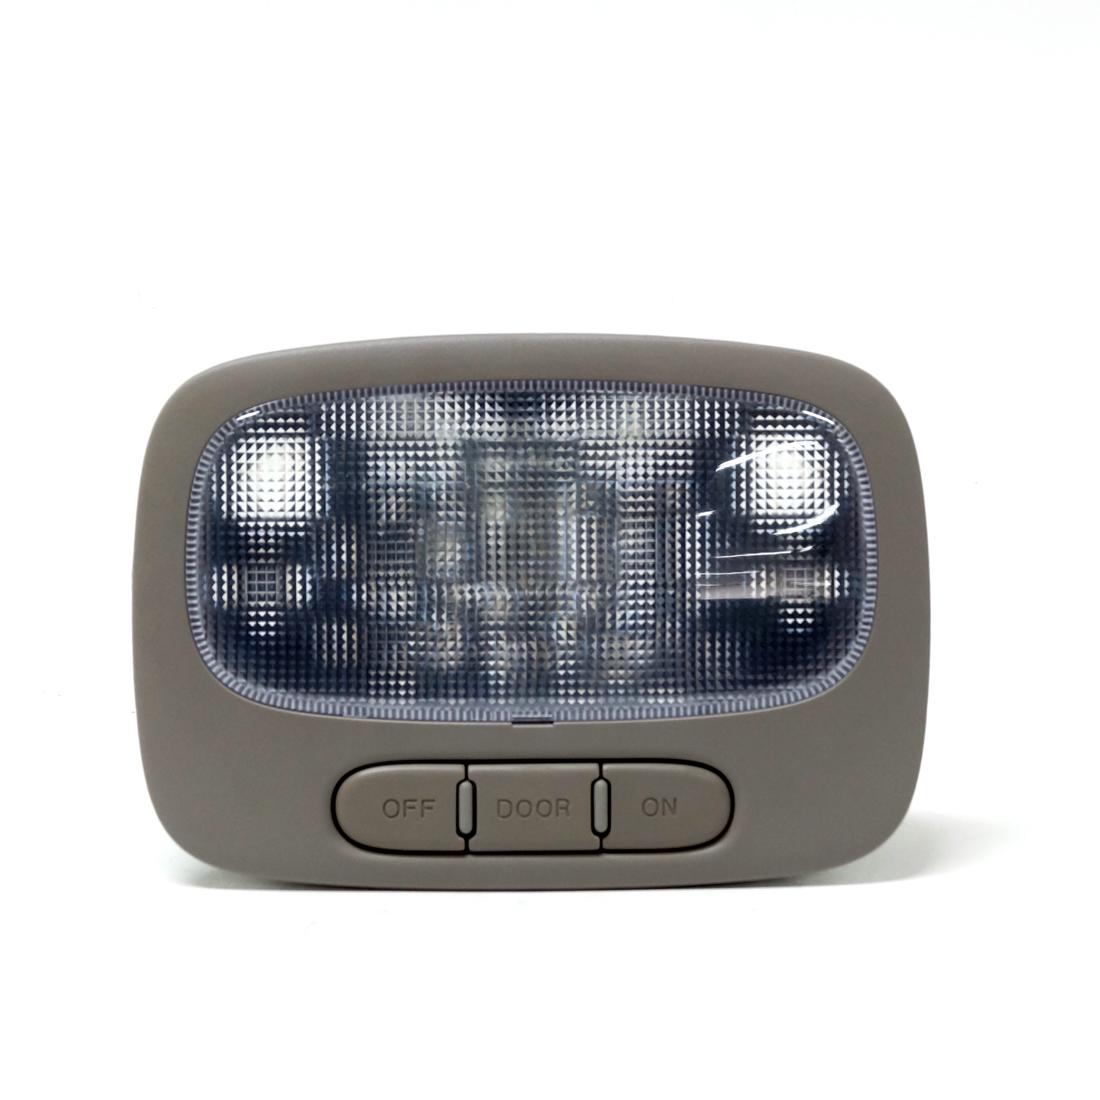 Kia Optima: Room lamp